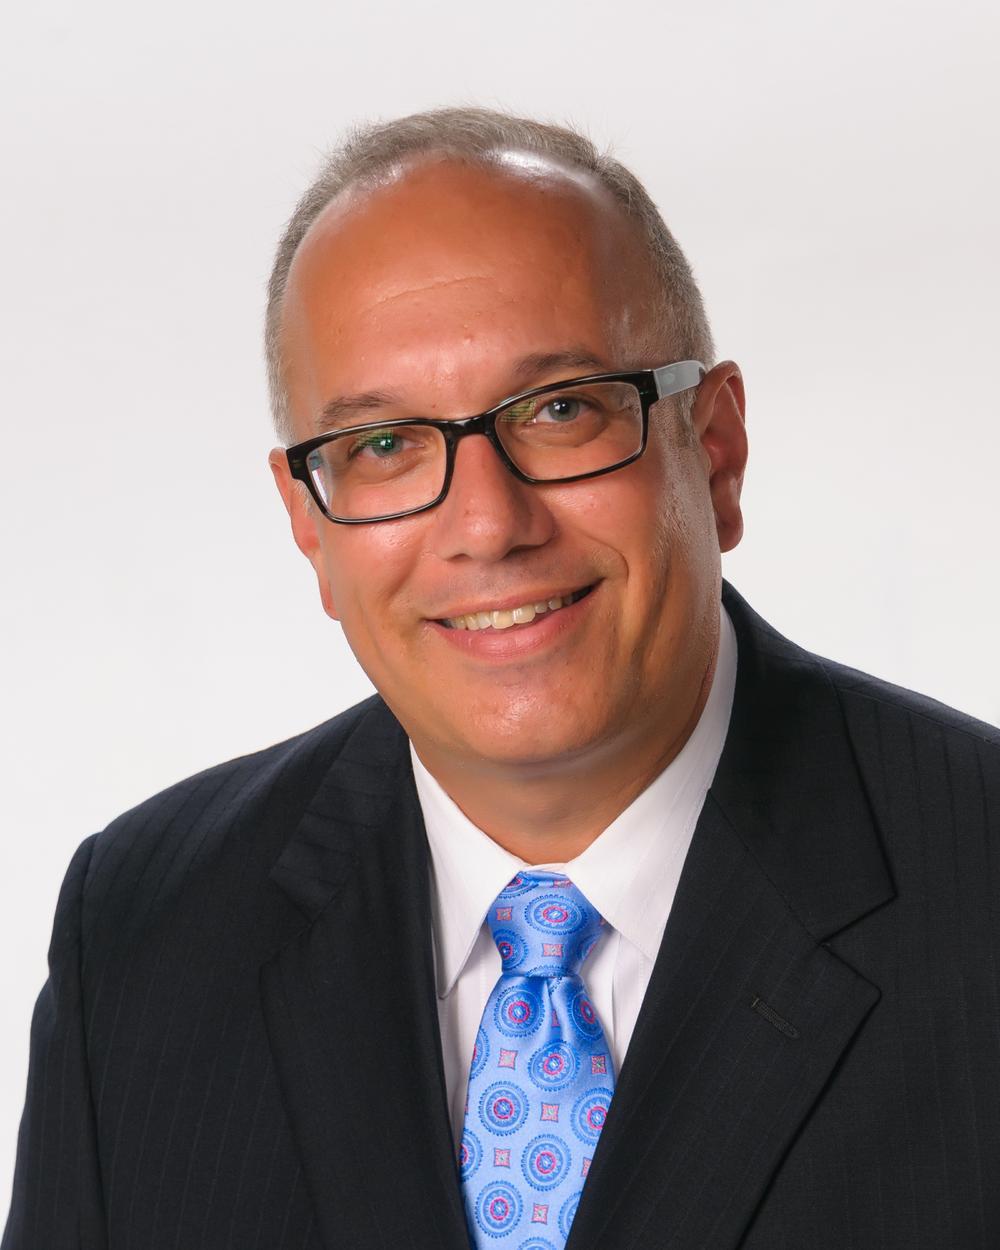 Michael J. Agriesti, CFP®, CRPC, LUTCF Hover Photo